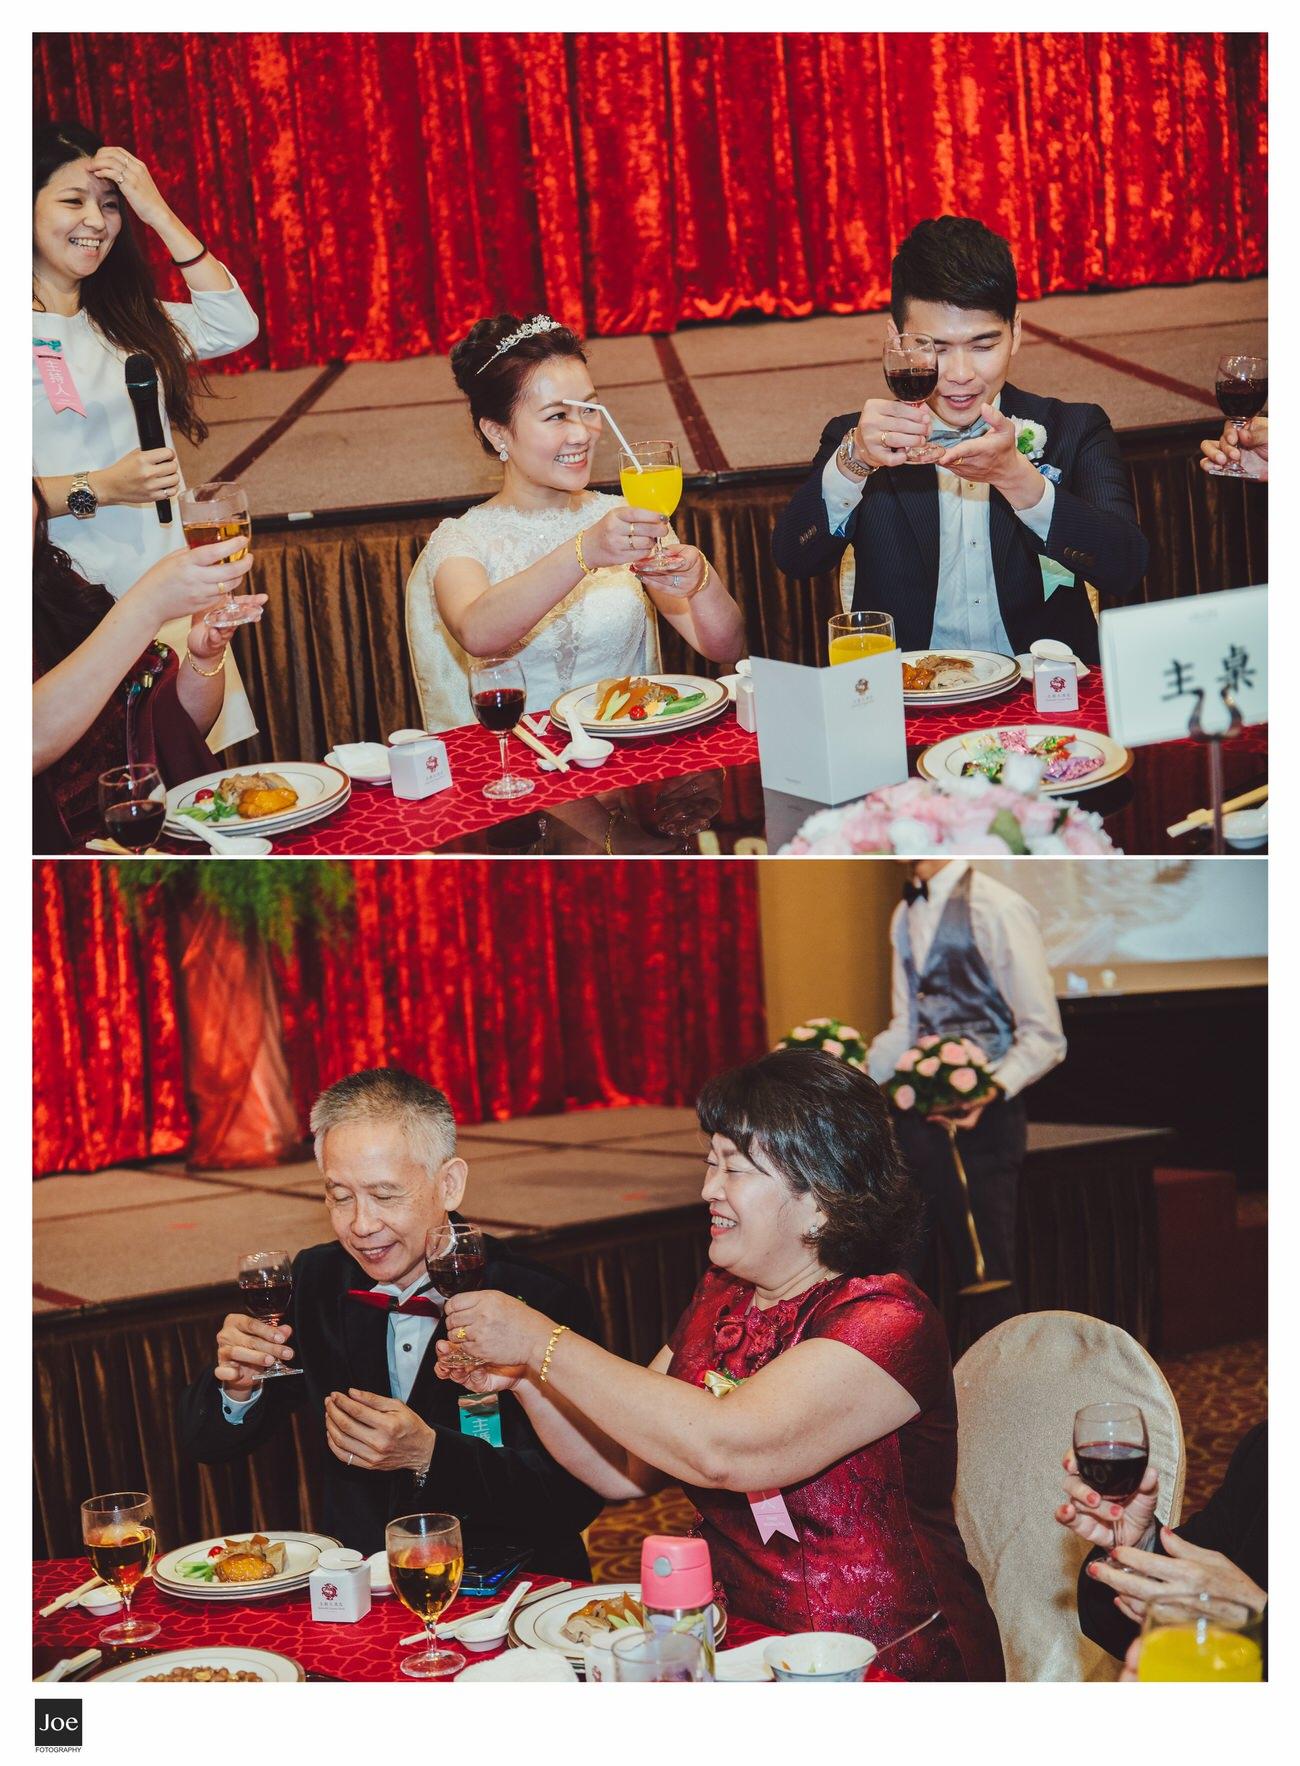 sunworld-dynasty-hotel-taipei-wedding-photo-joe-fotography-angel-jay-089.jpg